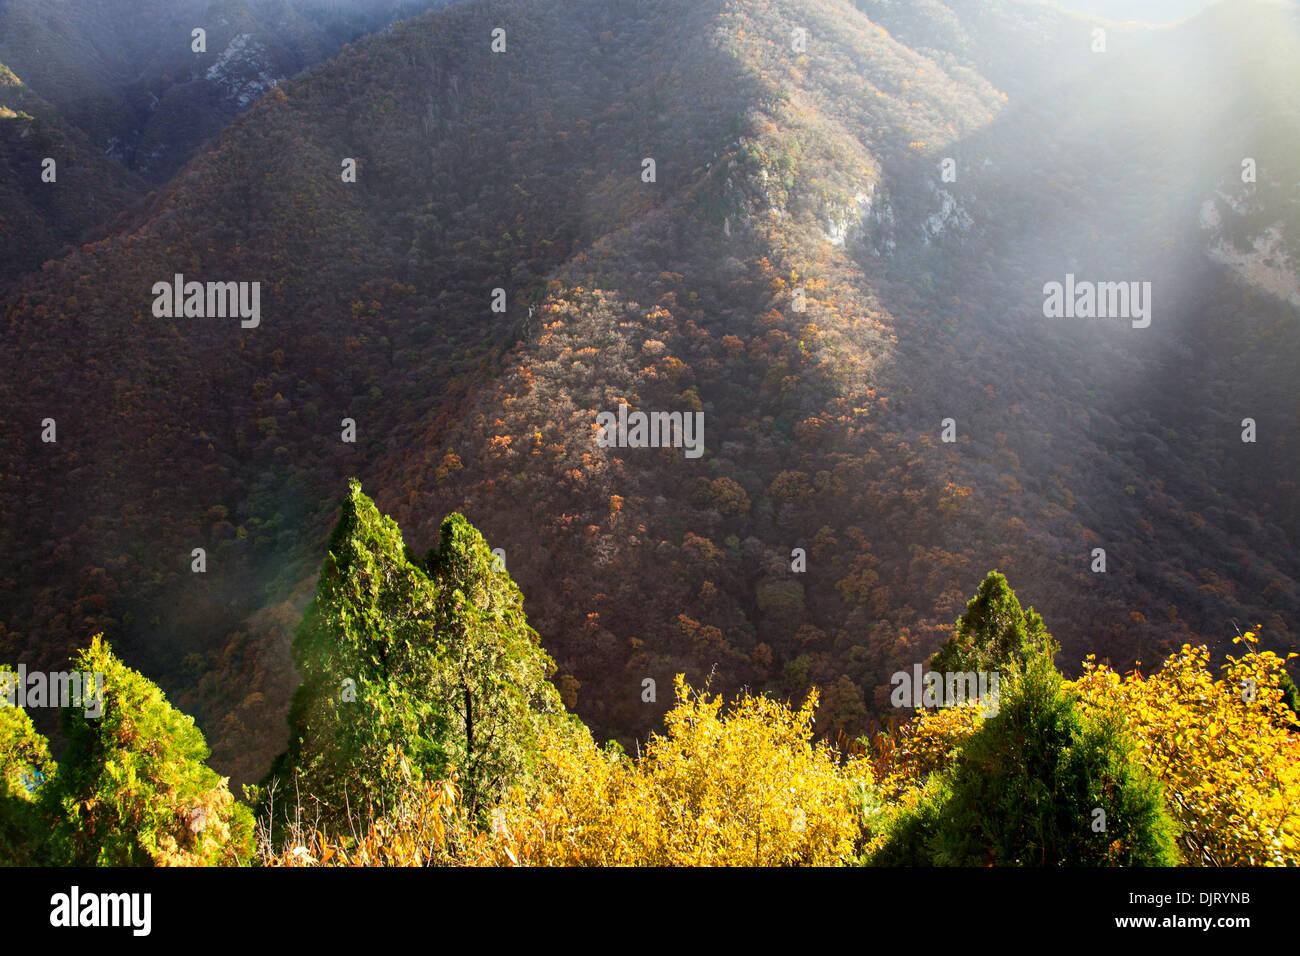 Mian Stock Photos & Mian Stock Images - Alamy